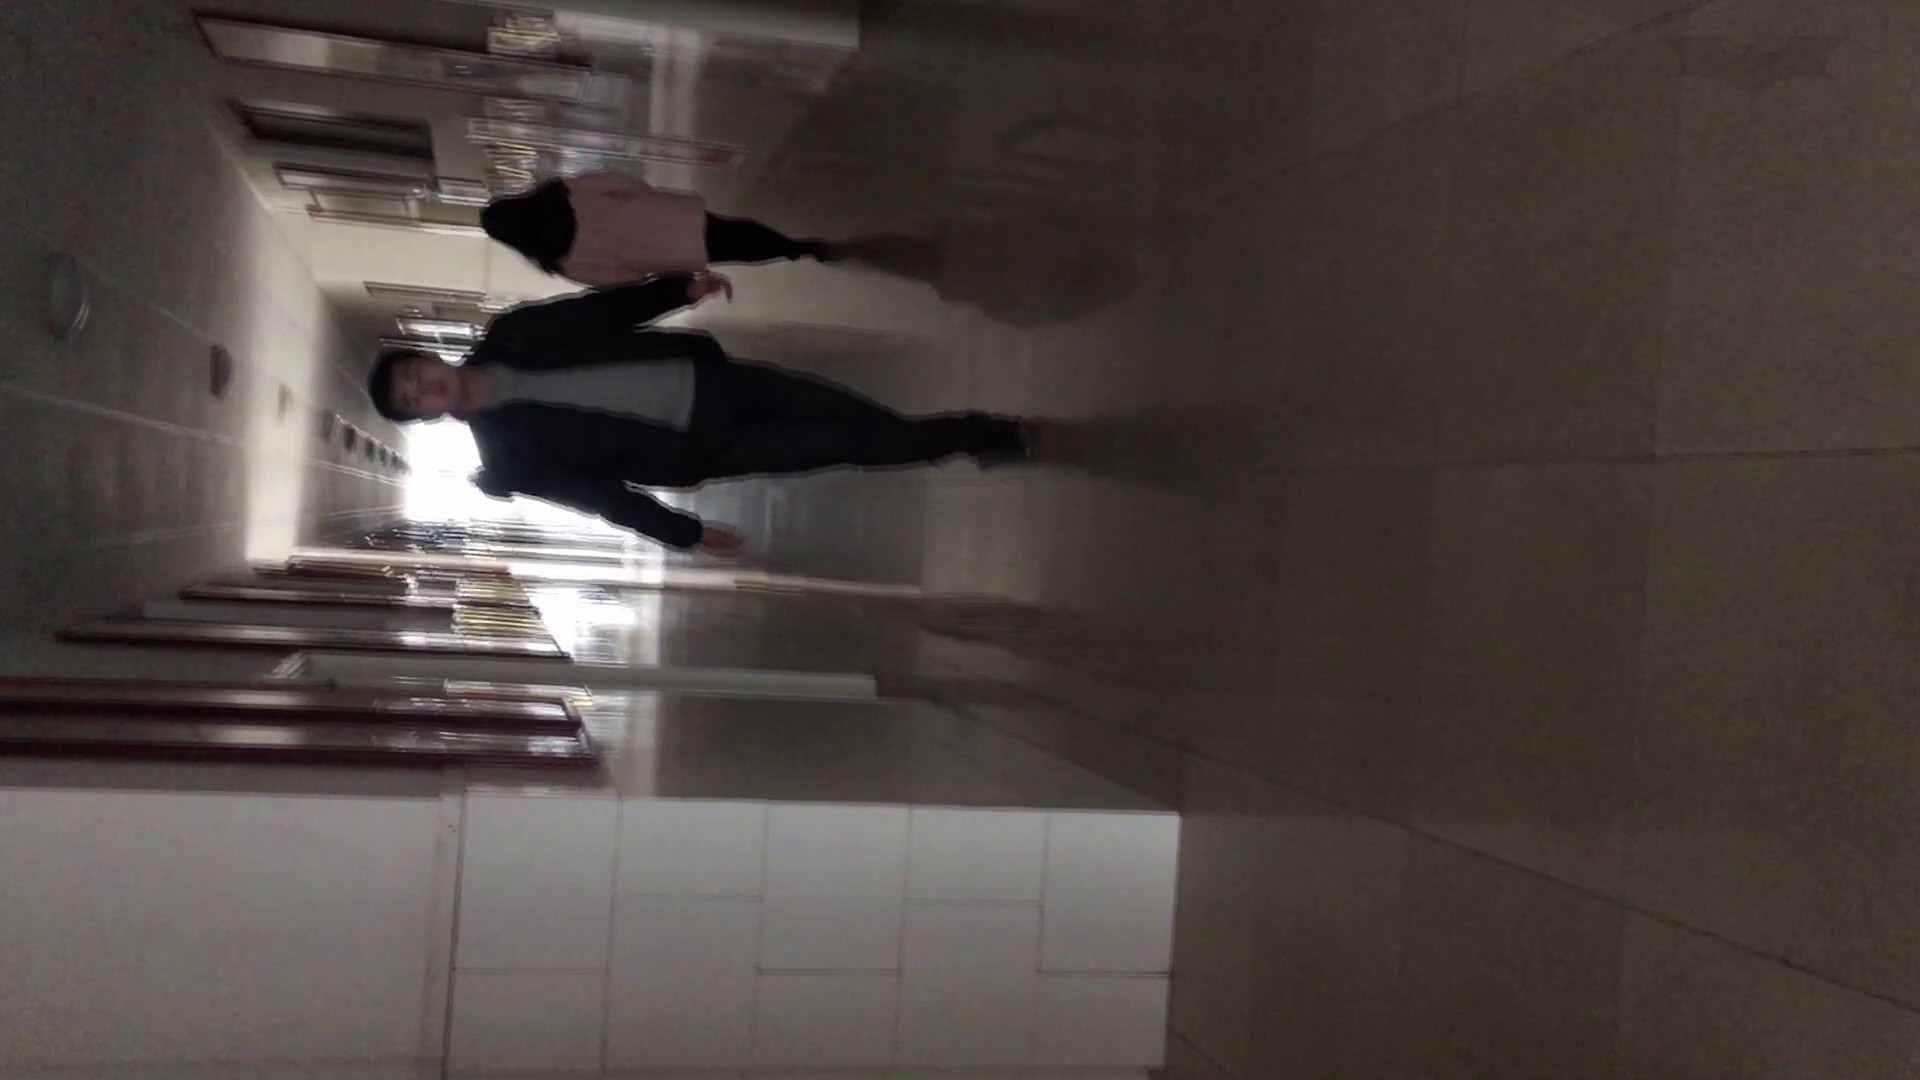 芸術大学ガチ潜入盗撮 JD盗撮 美女の洗面所の秘密 Vol.80 高評価 ワレメ動画紹介 69画像 21